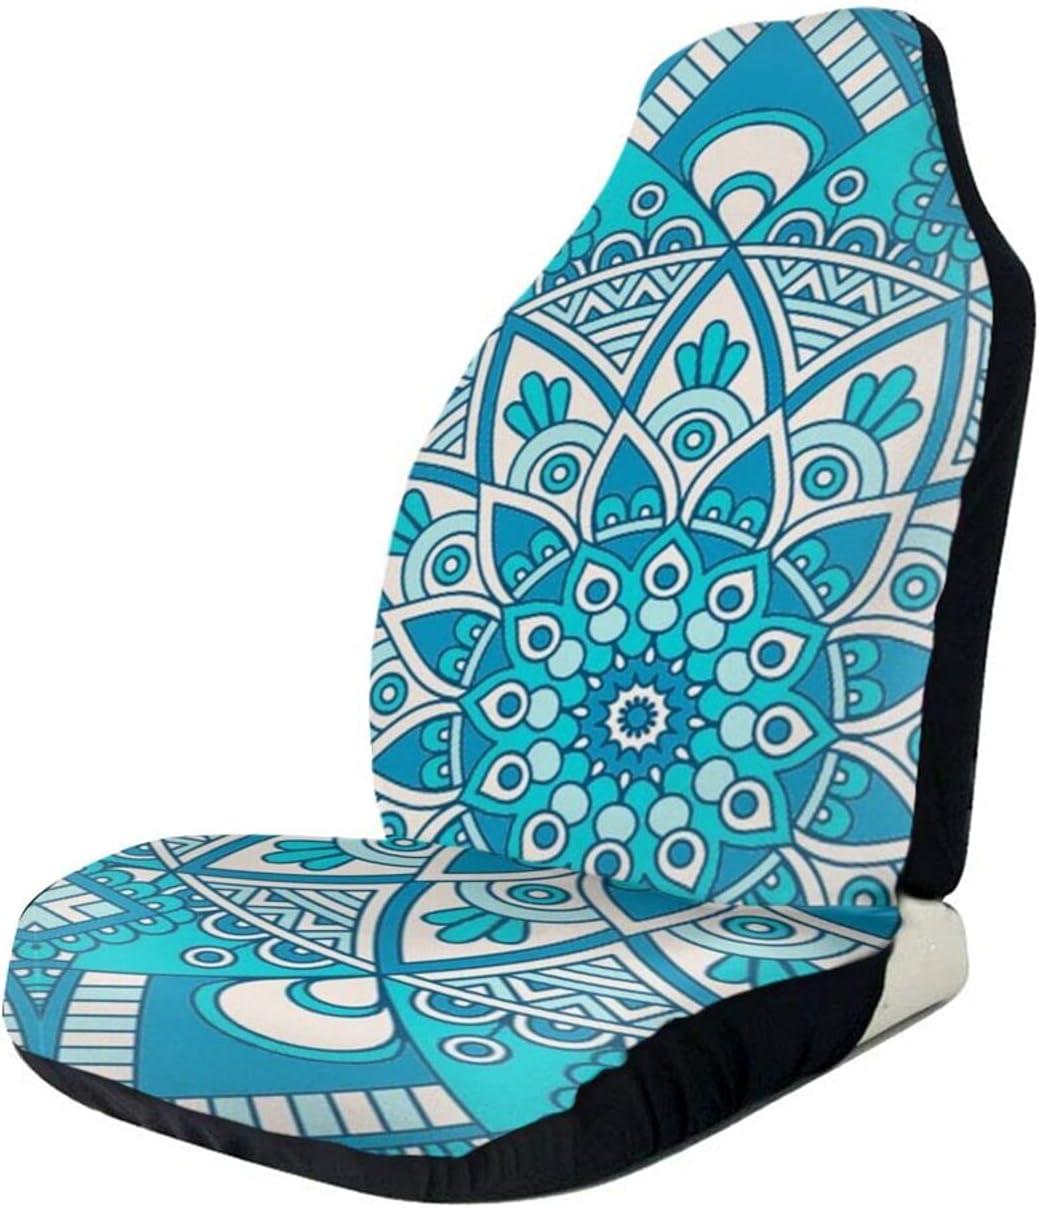 NGLKJUS Vintage Mandala Flowers Car Front Ranking TOP11 online shop Seat Se Covers Printed